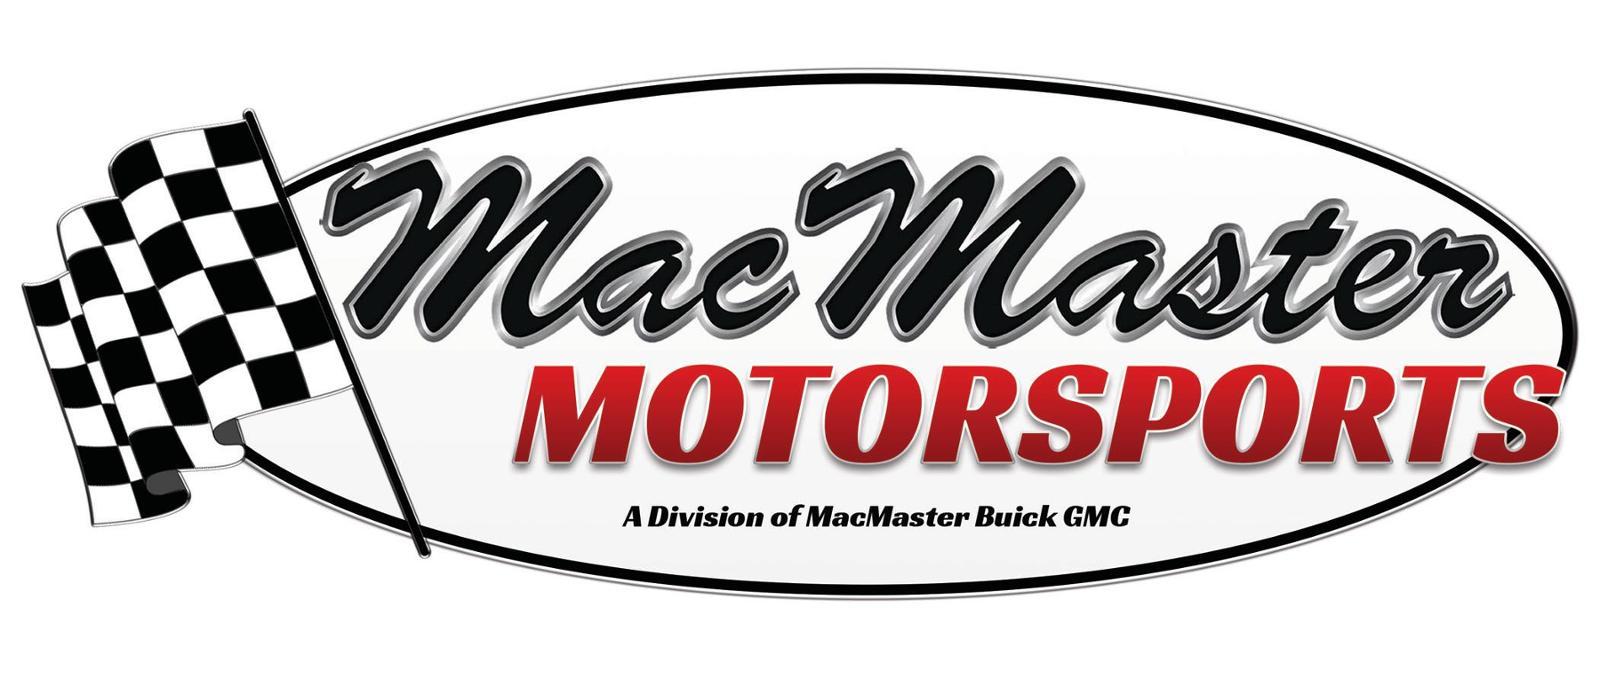 Macmaster Motorsports